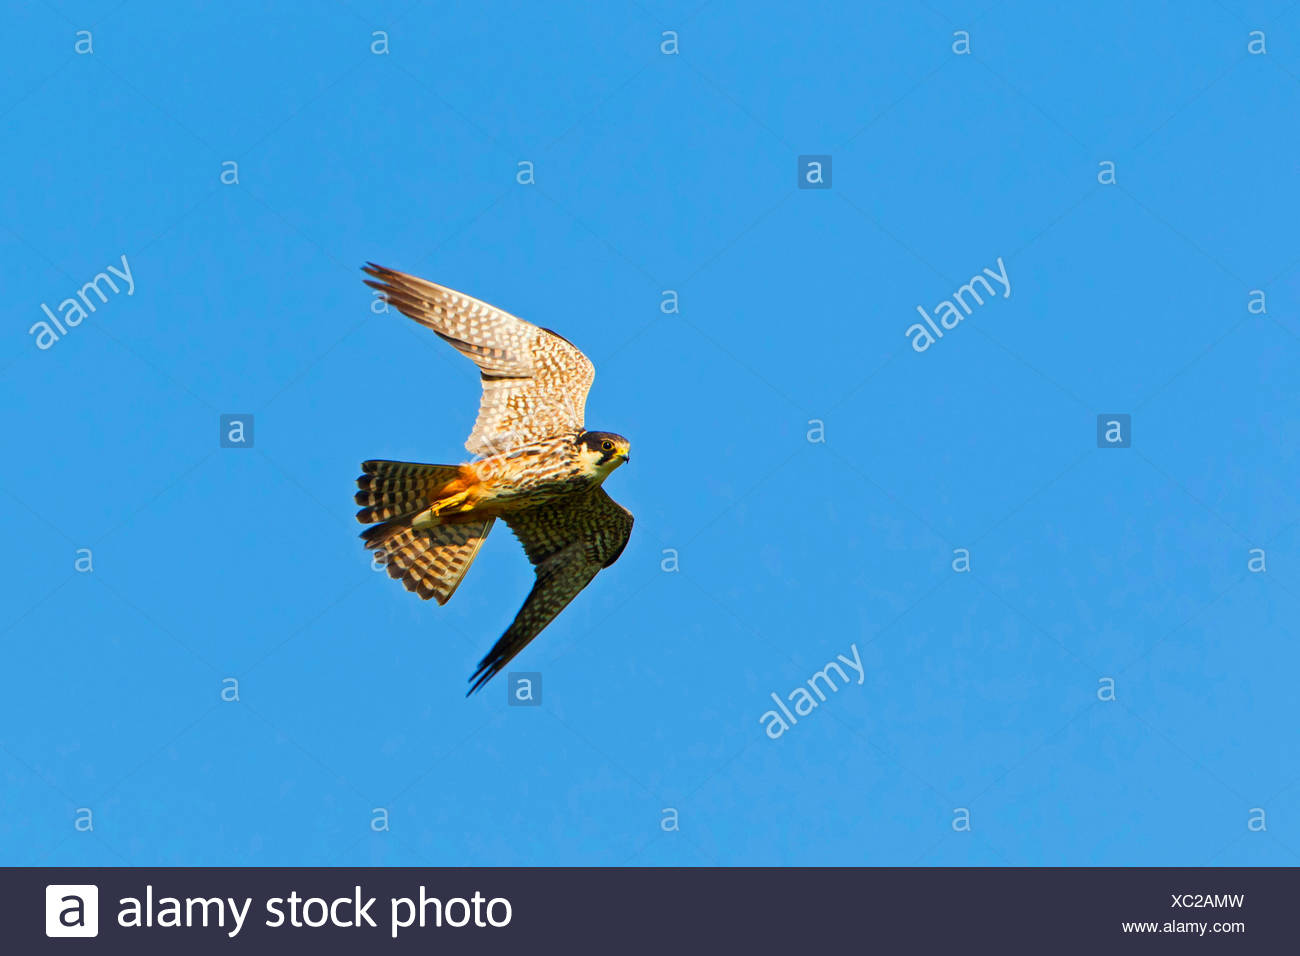 Le nord de l'hobby (Falco subbuteo), voler, Allemagne, Rhénanie-Palatinat Photo Stock